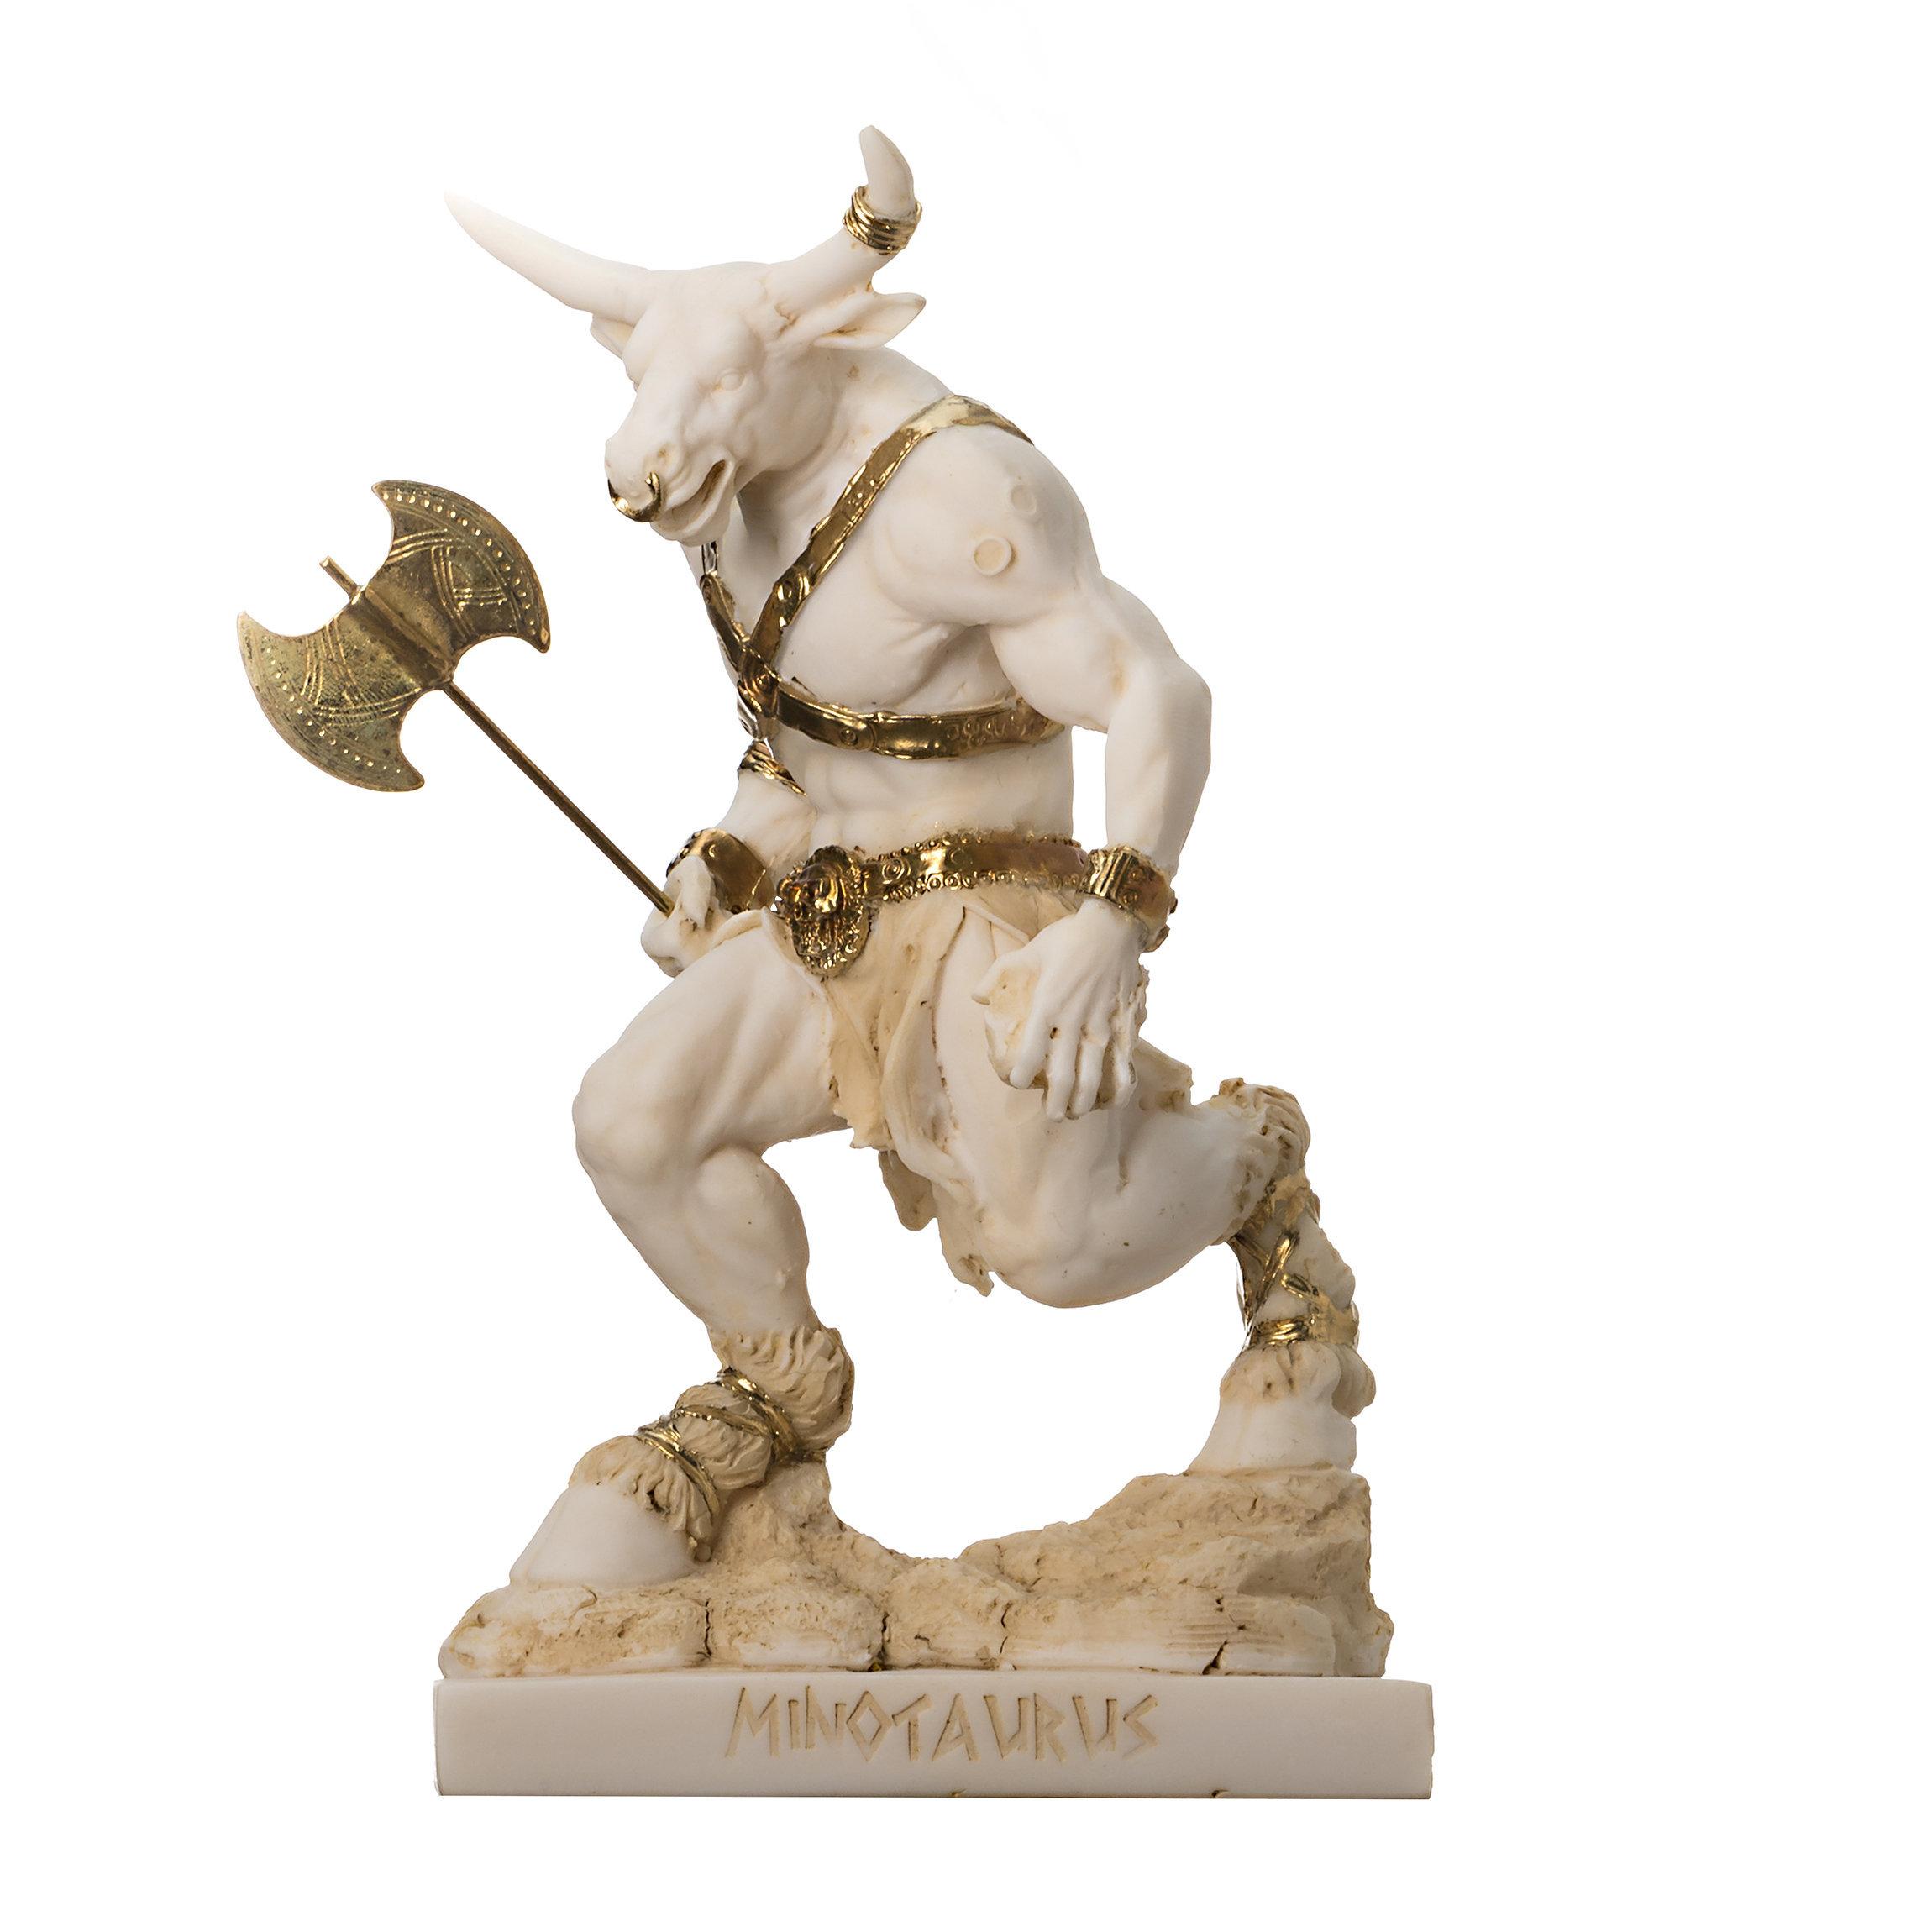 Minotaur Greek Mythology With Labrys Statue Gold Alabaster 8''